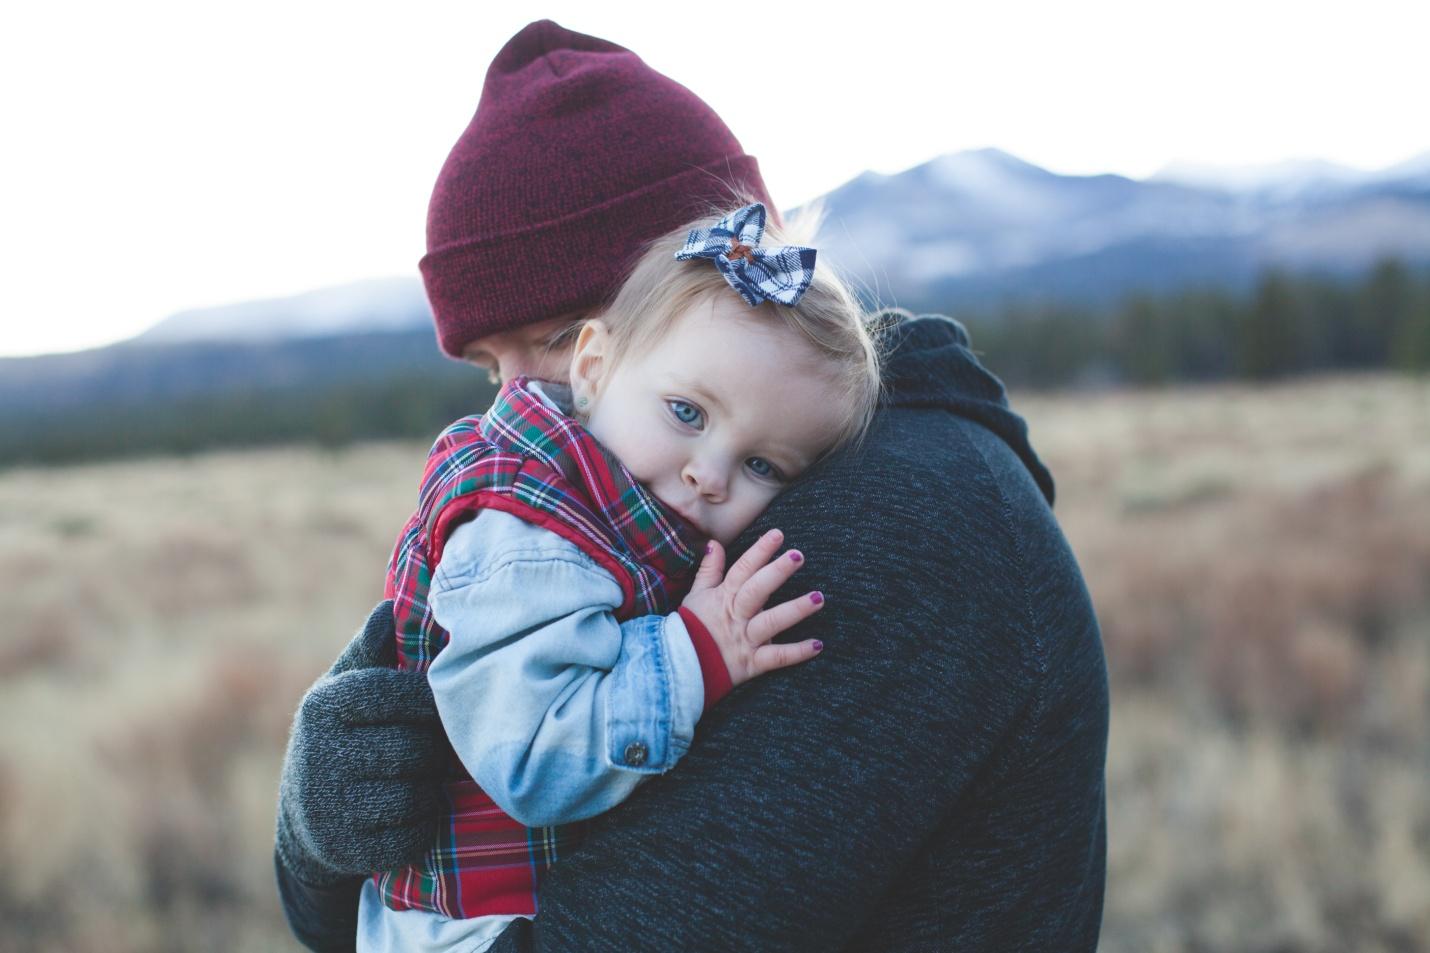 Dhimi dhimi aanch mai tapta gaya-Fathers day